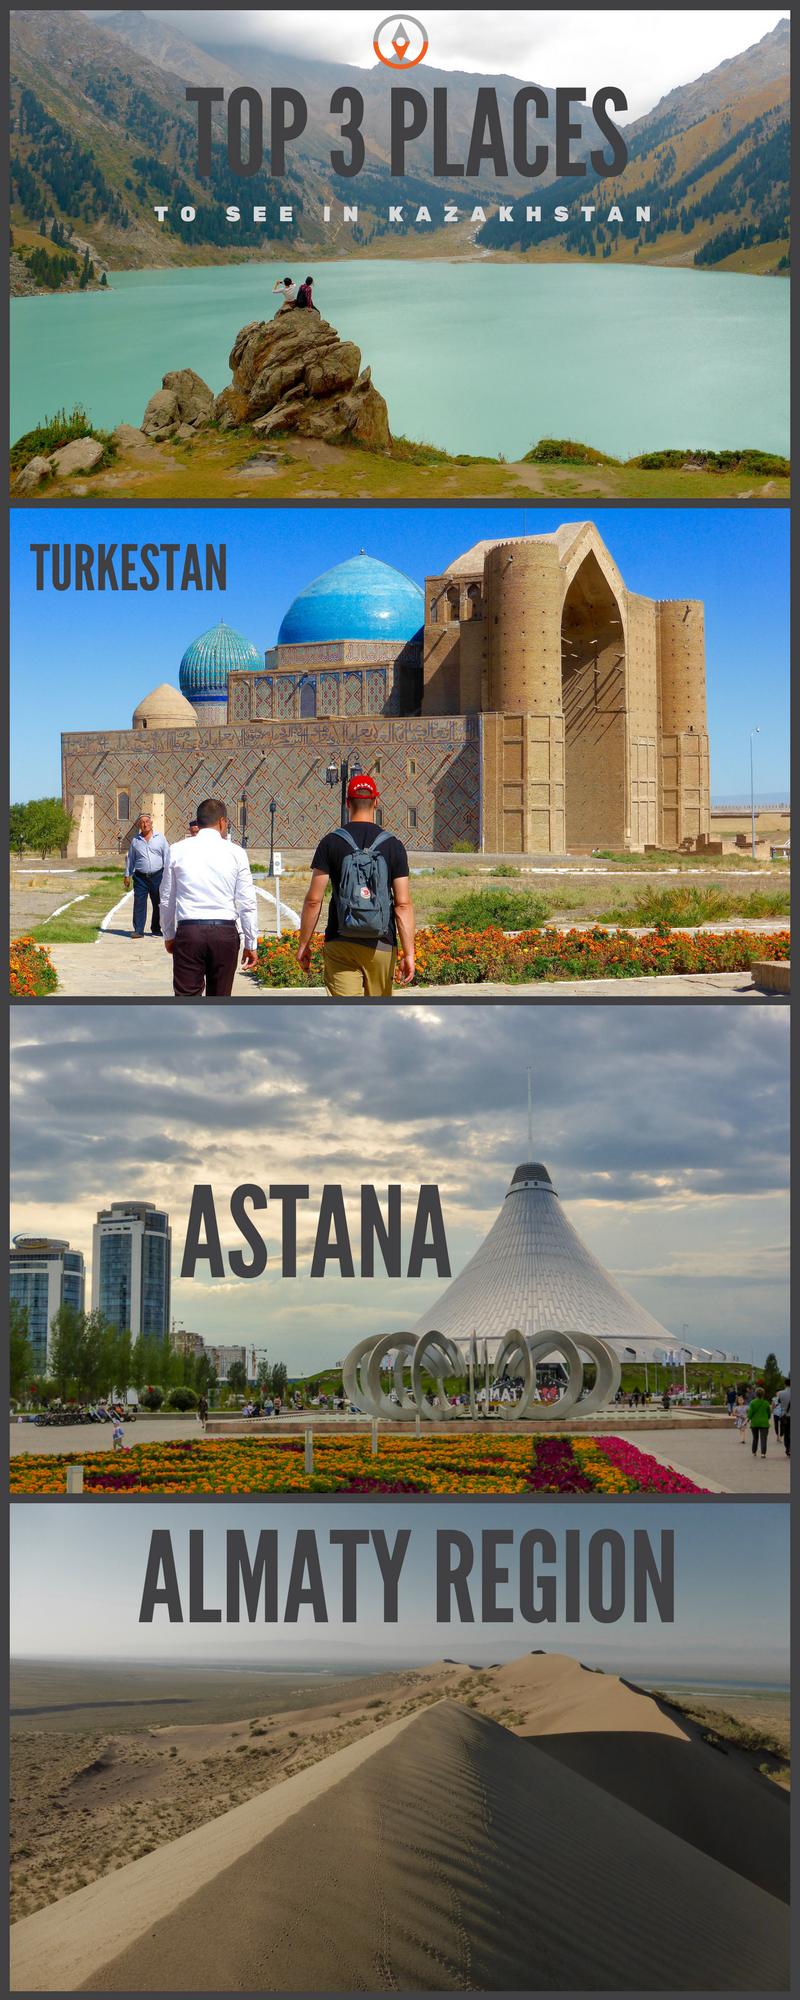 Kazakhstan Top 5 Places To Travel Viajes Kazajistan Lugares